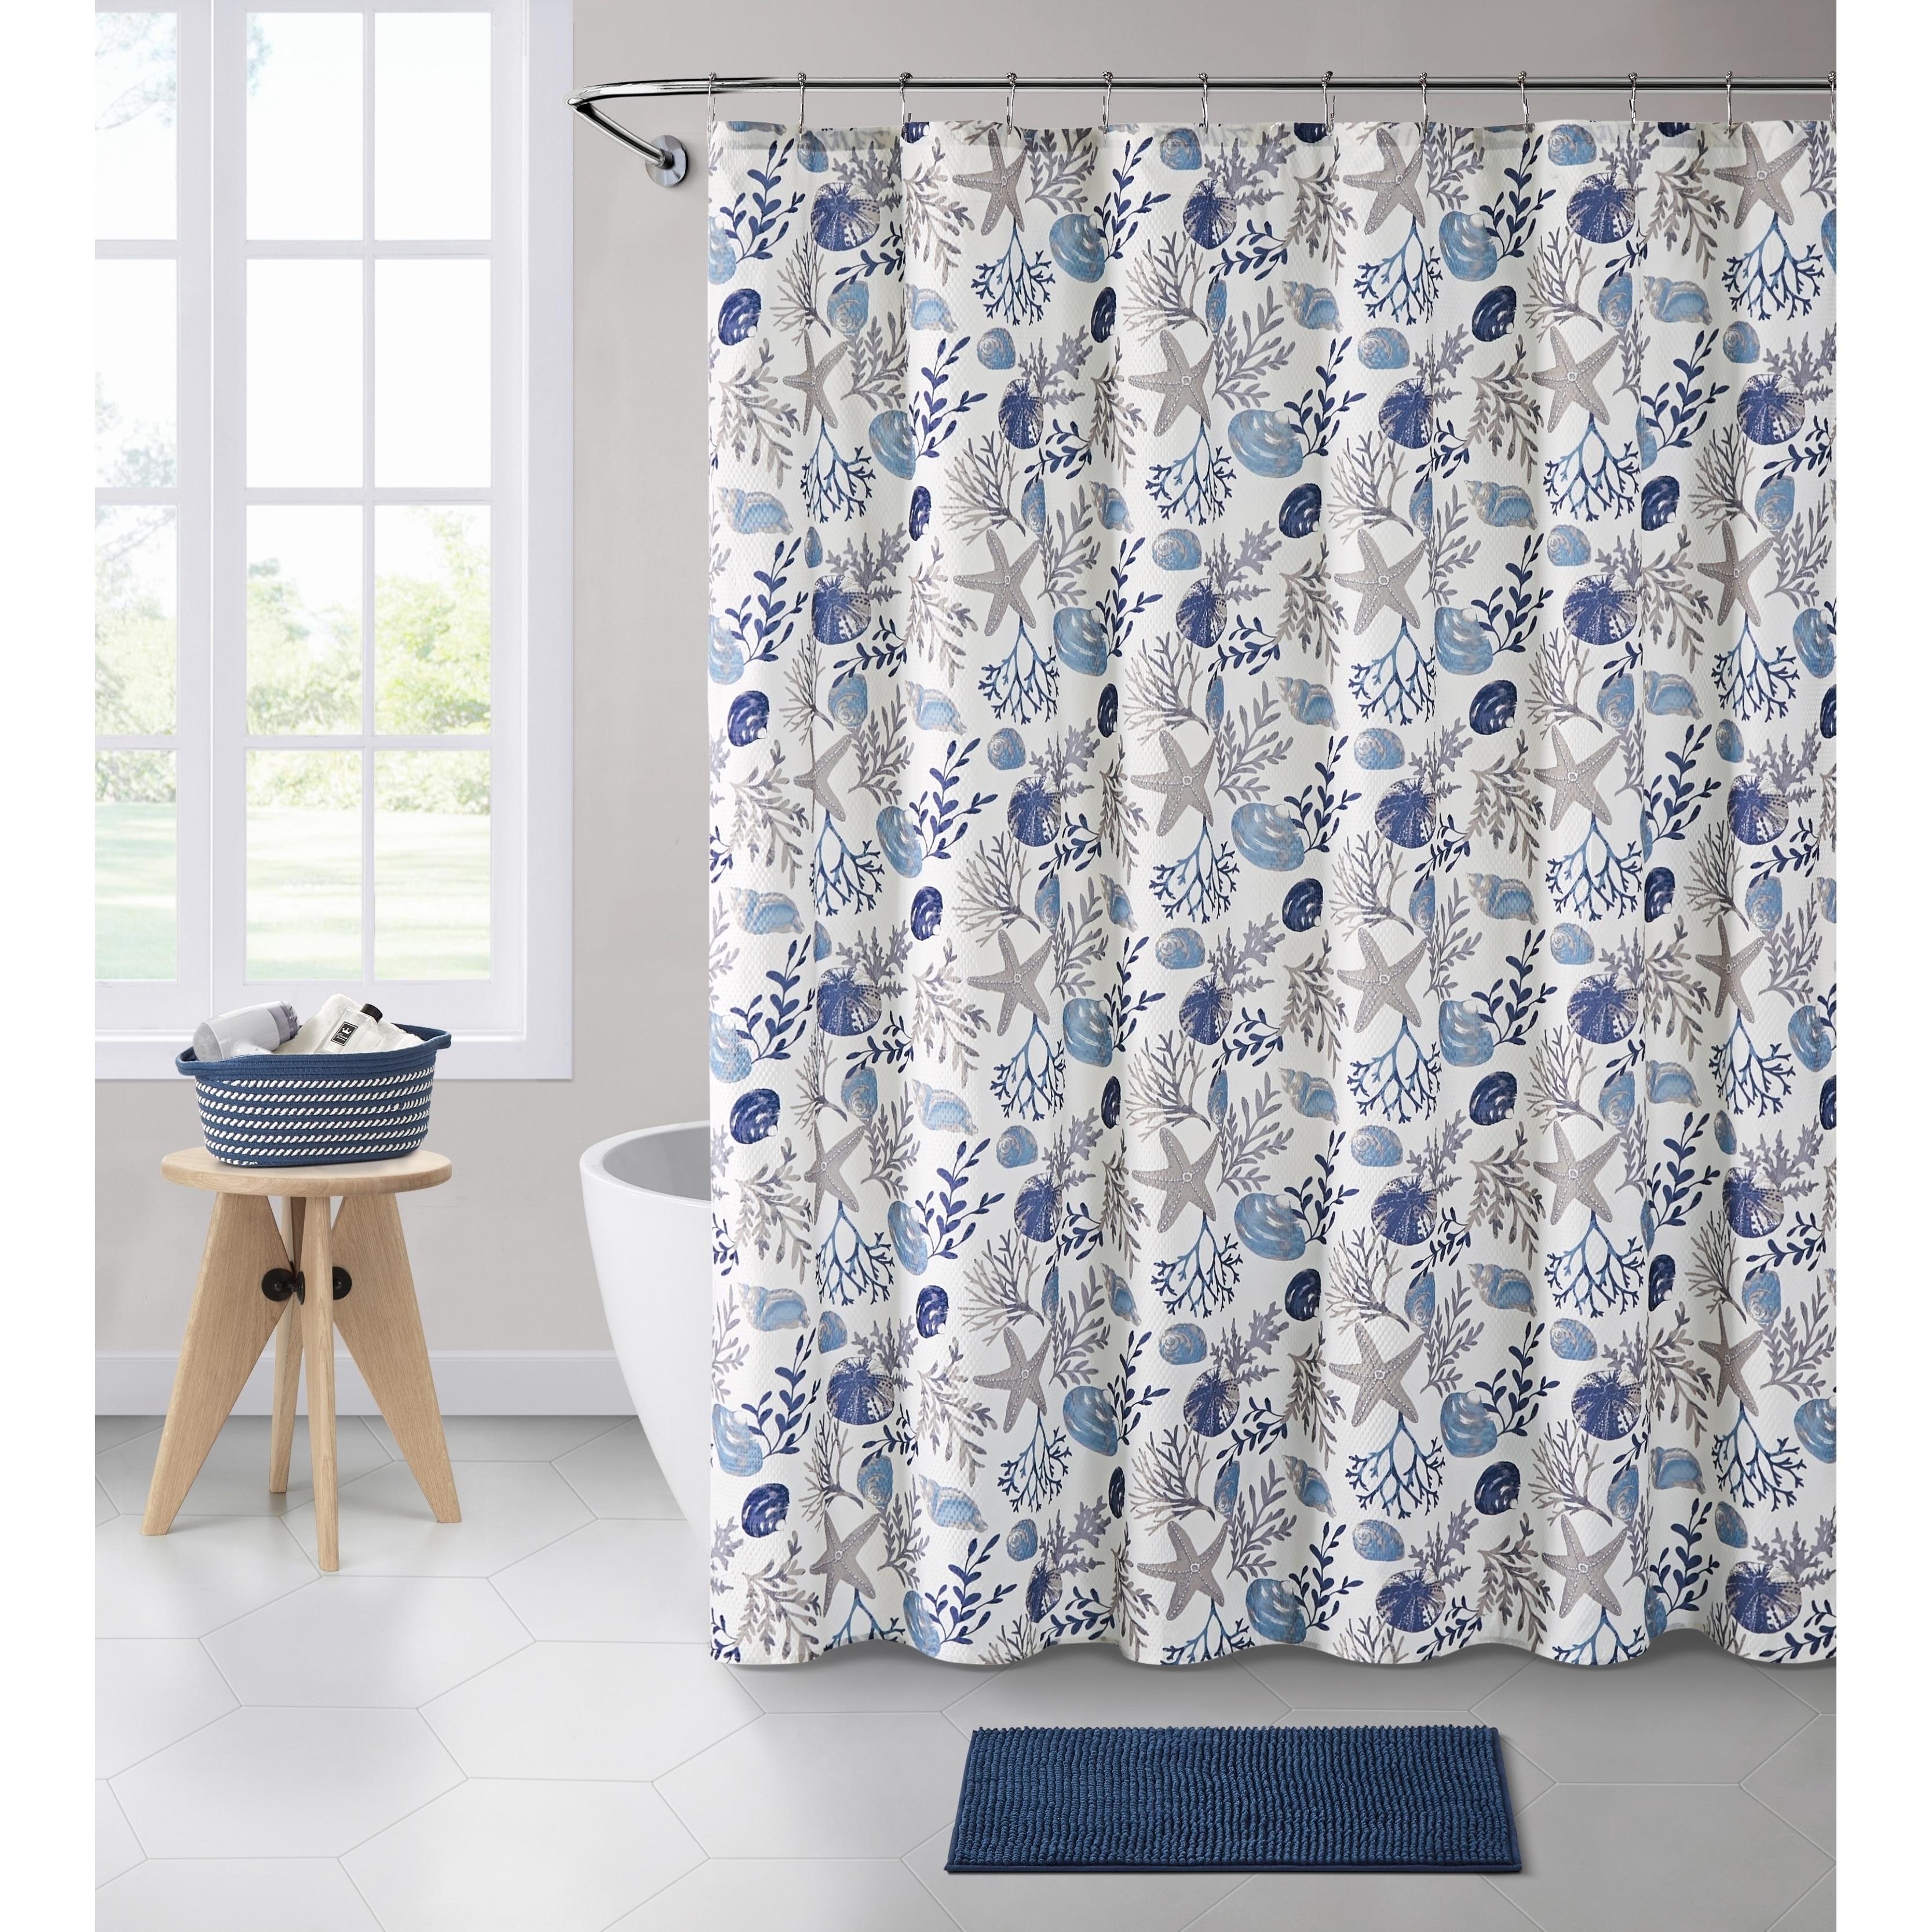 Vcny Home Antigua Seashell Shower Curtain Bath Bundle